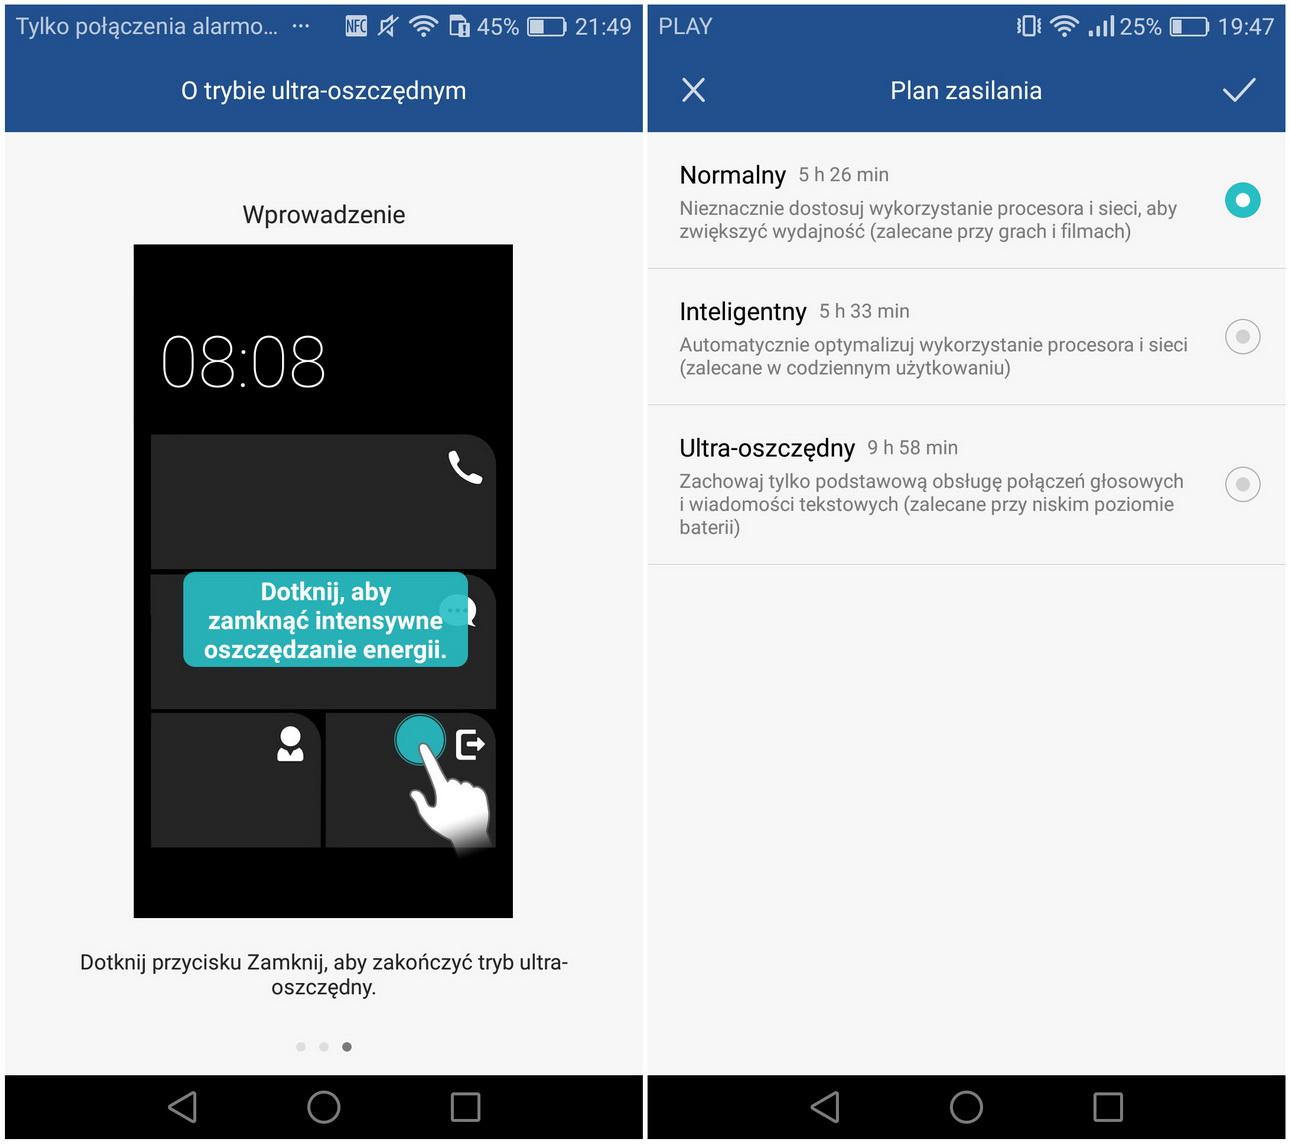 Huawei P9 Lite - recenzja 90sekund.pl